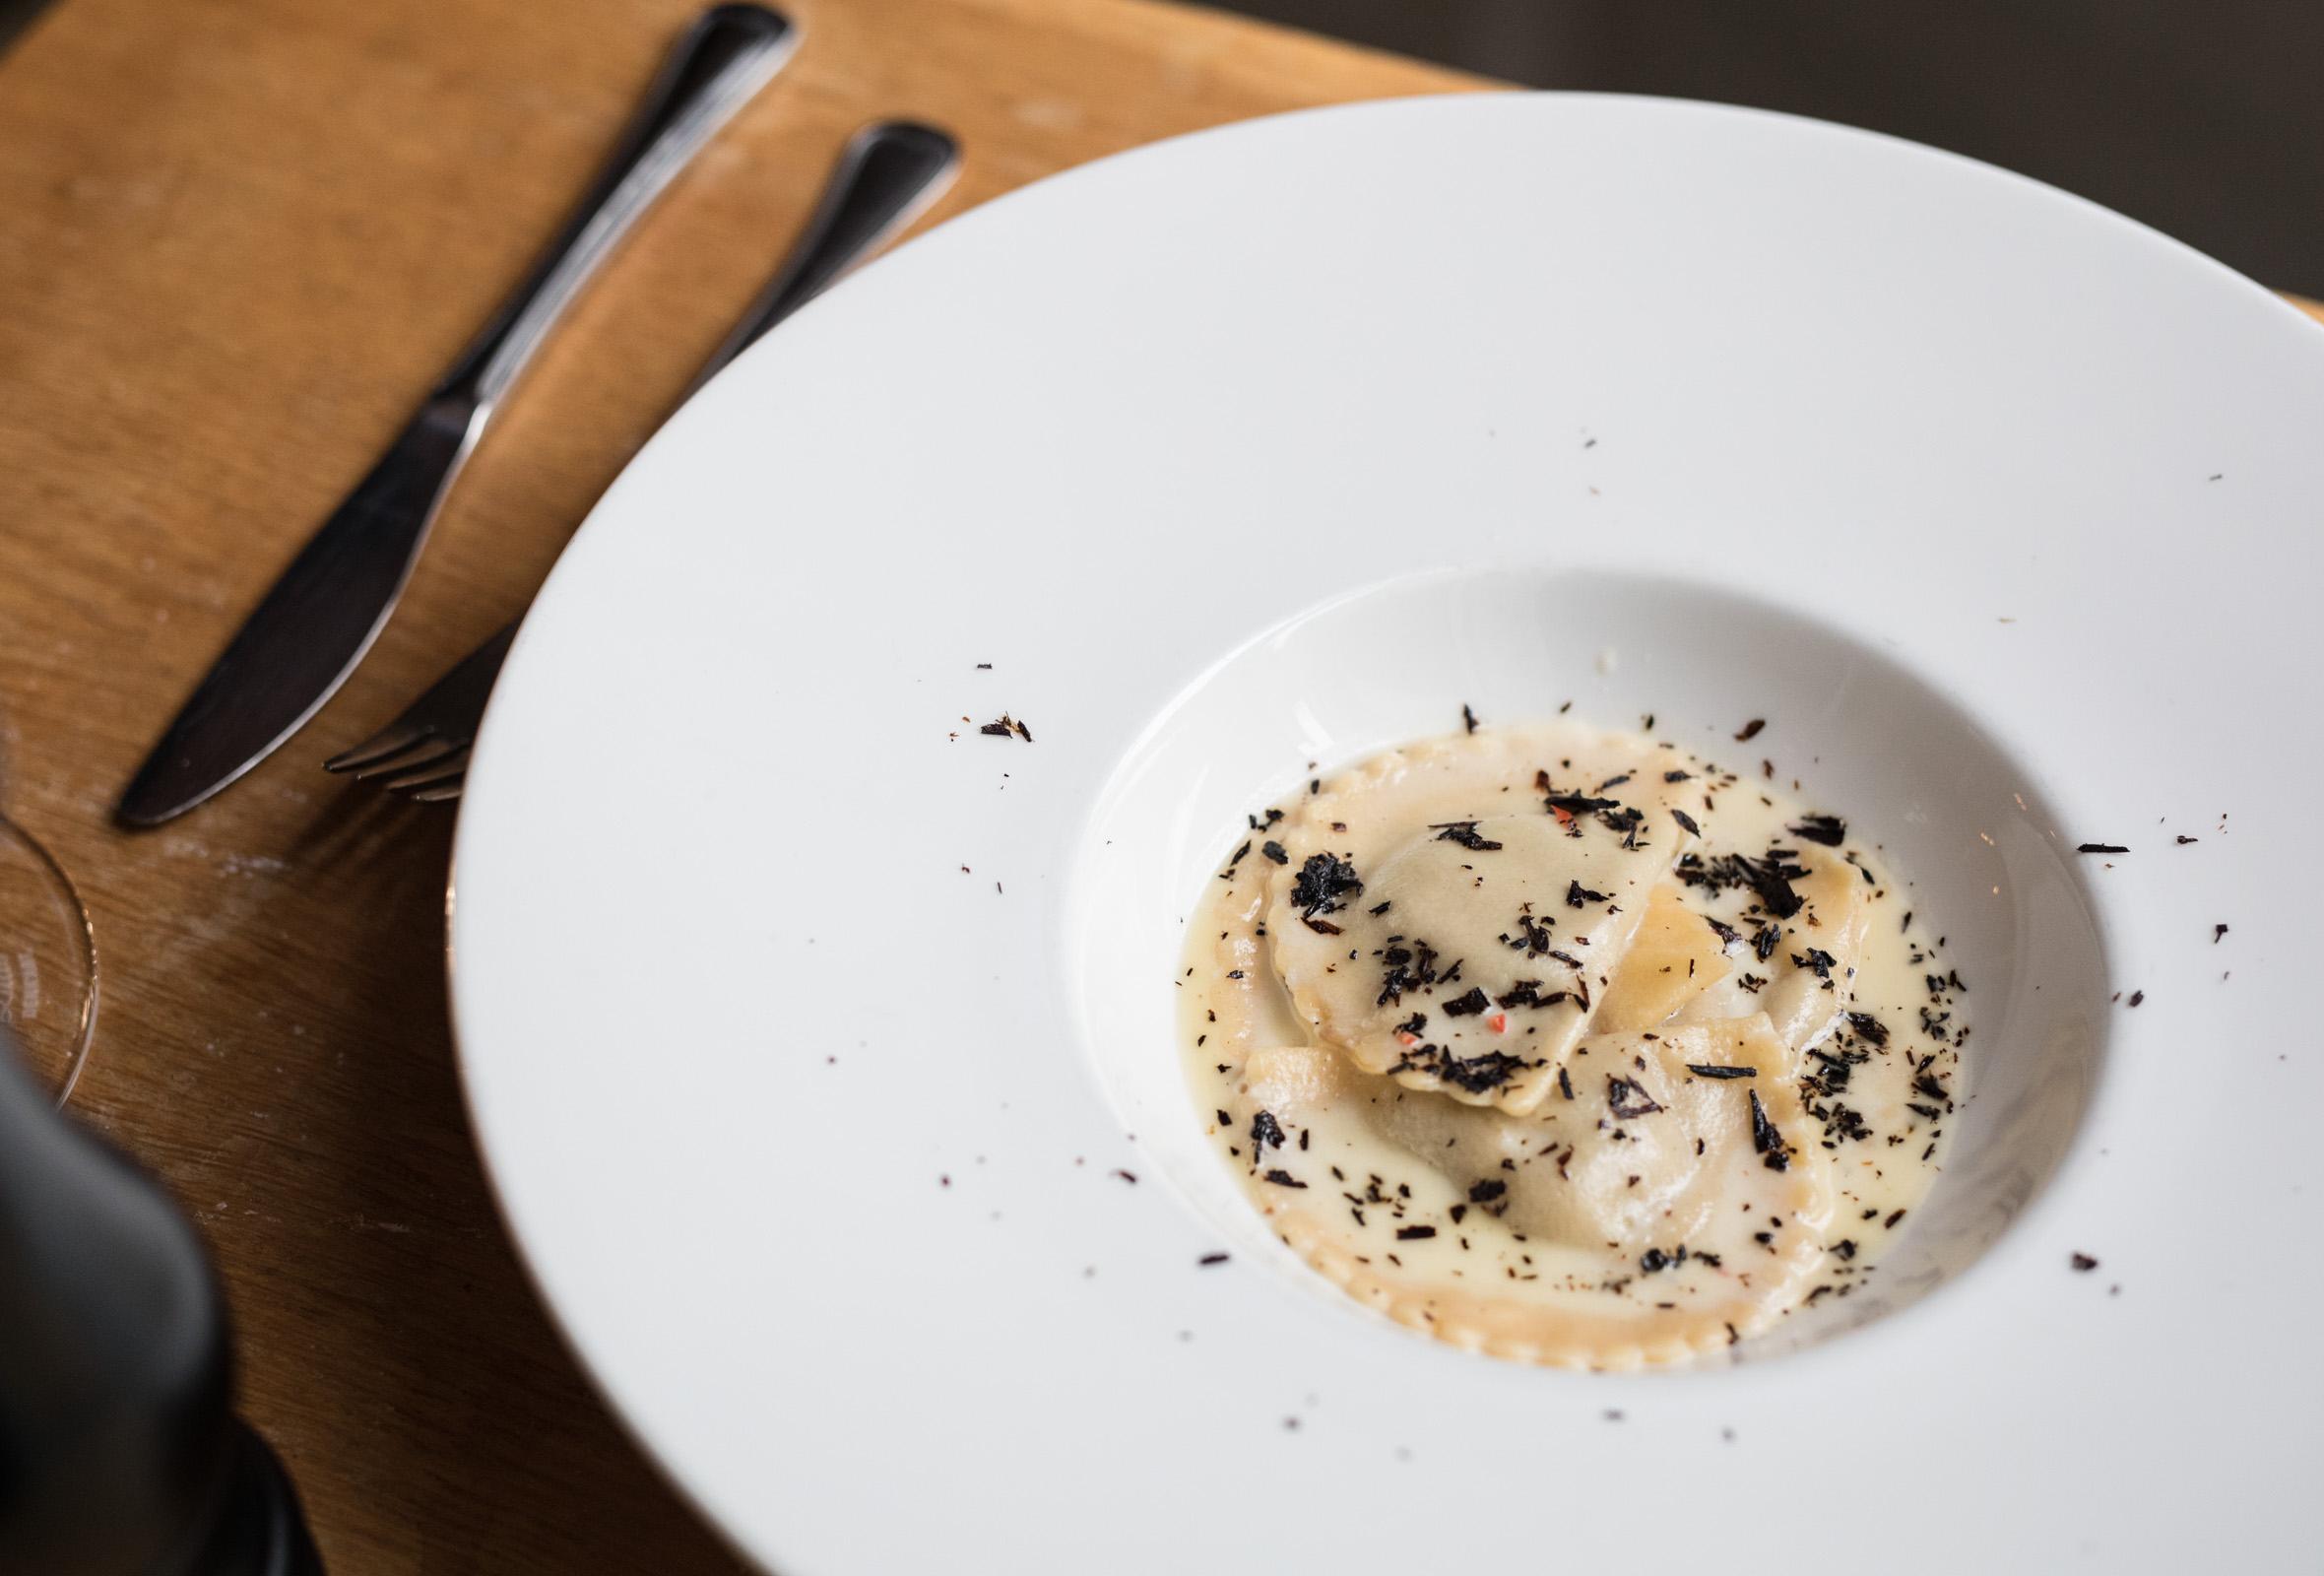 3-retters gourmet-middag hos Casa d'Antino i Indre By – Italiensk toprestaurant slår benene væk under gæster og madanmeldere